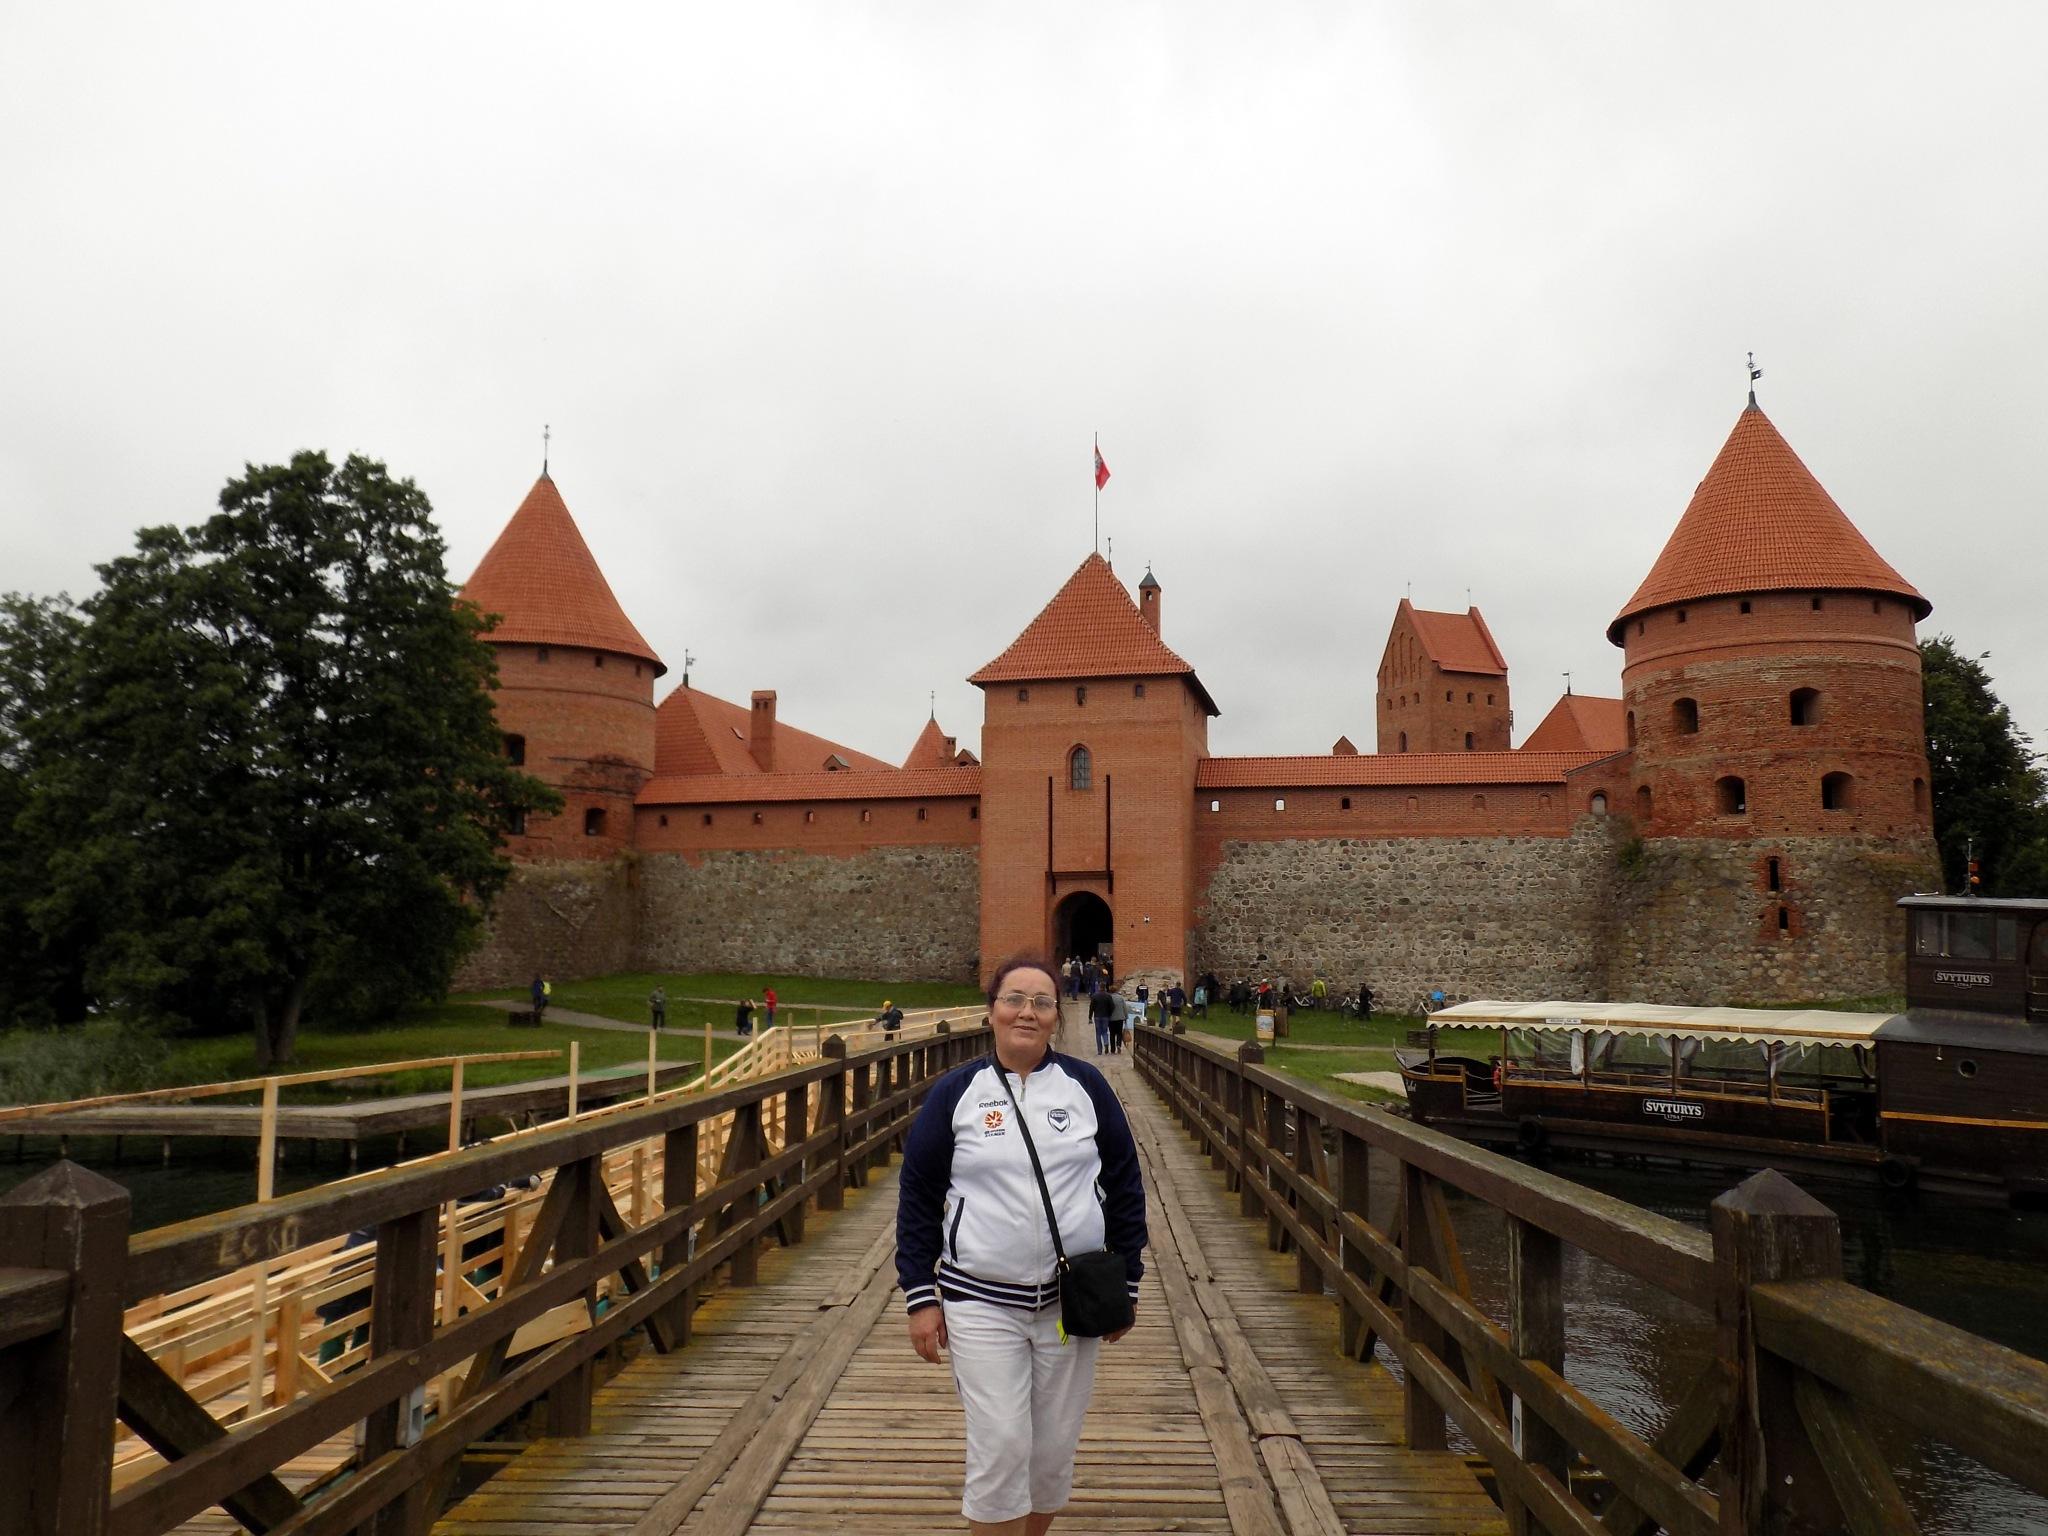 The old castle. by uzkuraitiene62